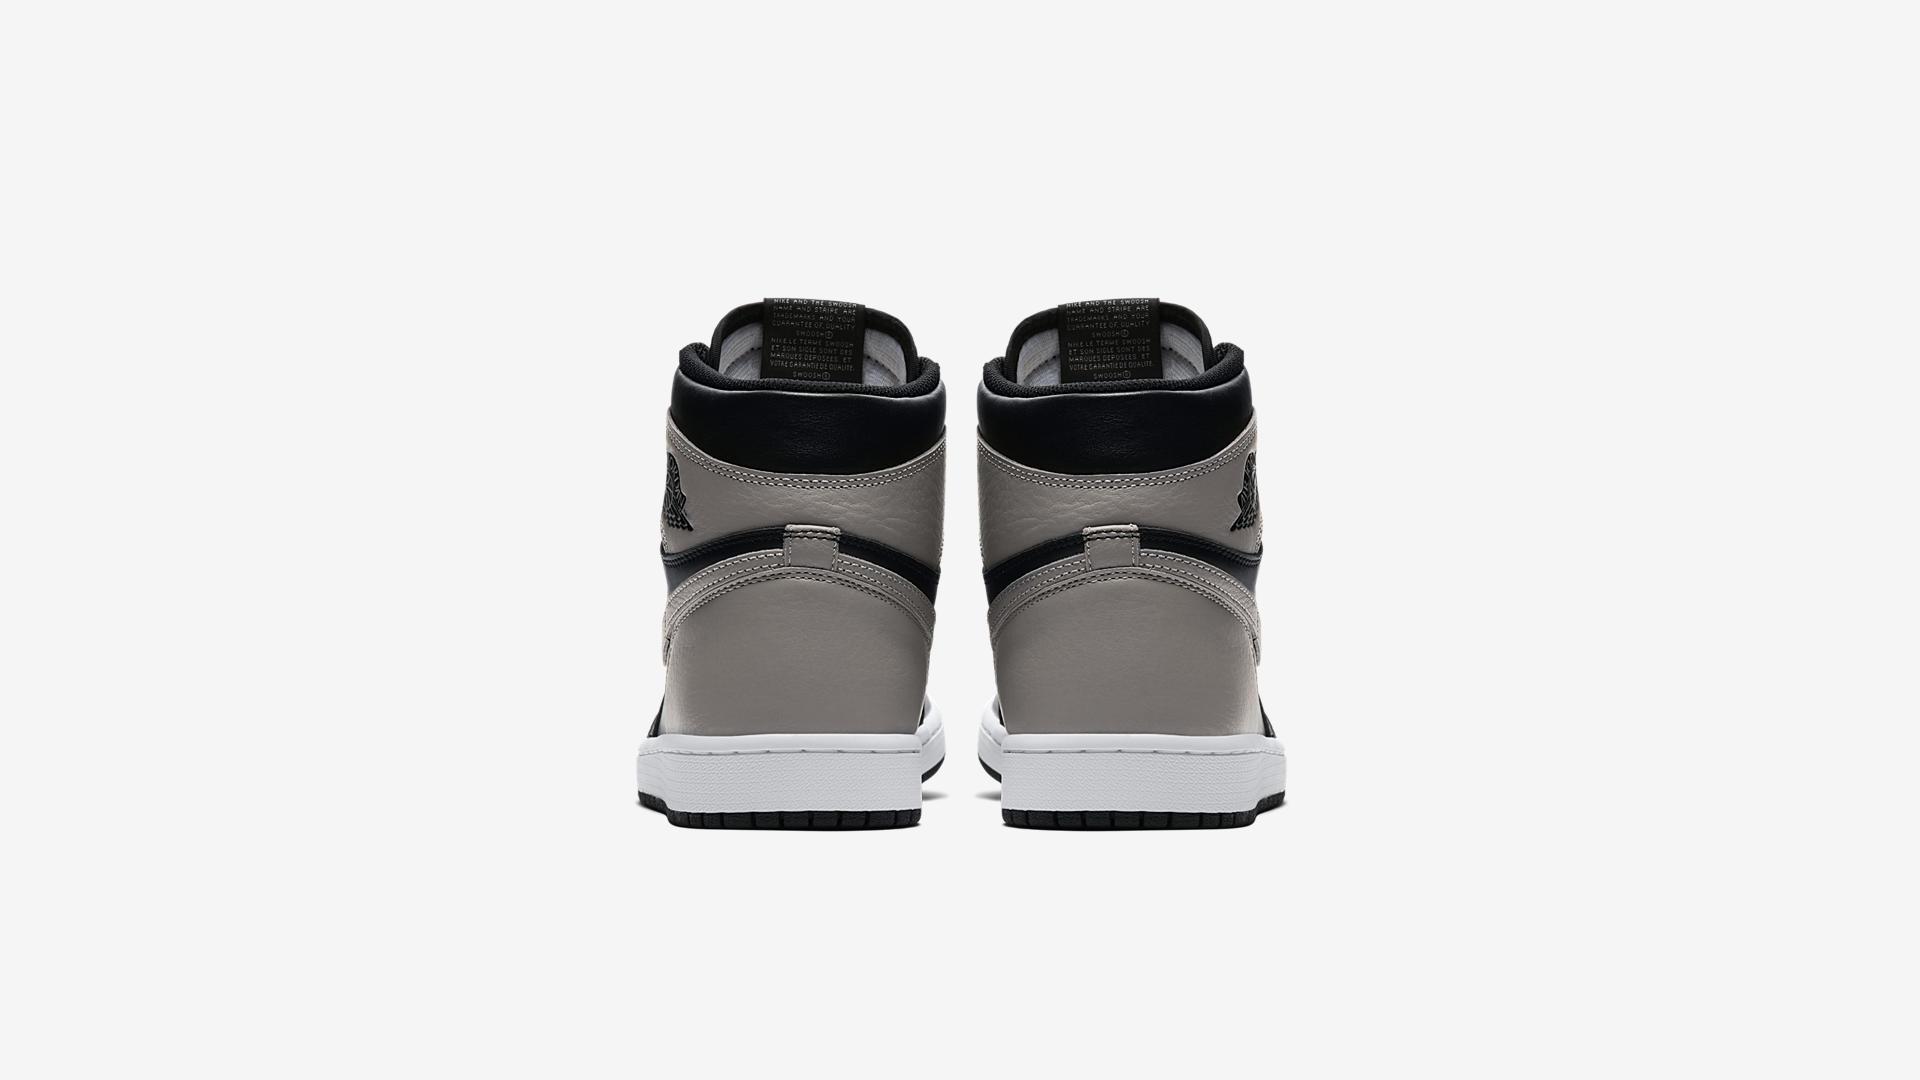 555088 013 Air Jordan 1 Retro High OG Shadow 1